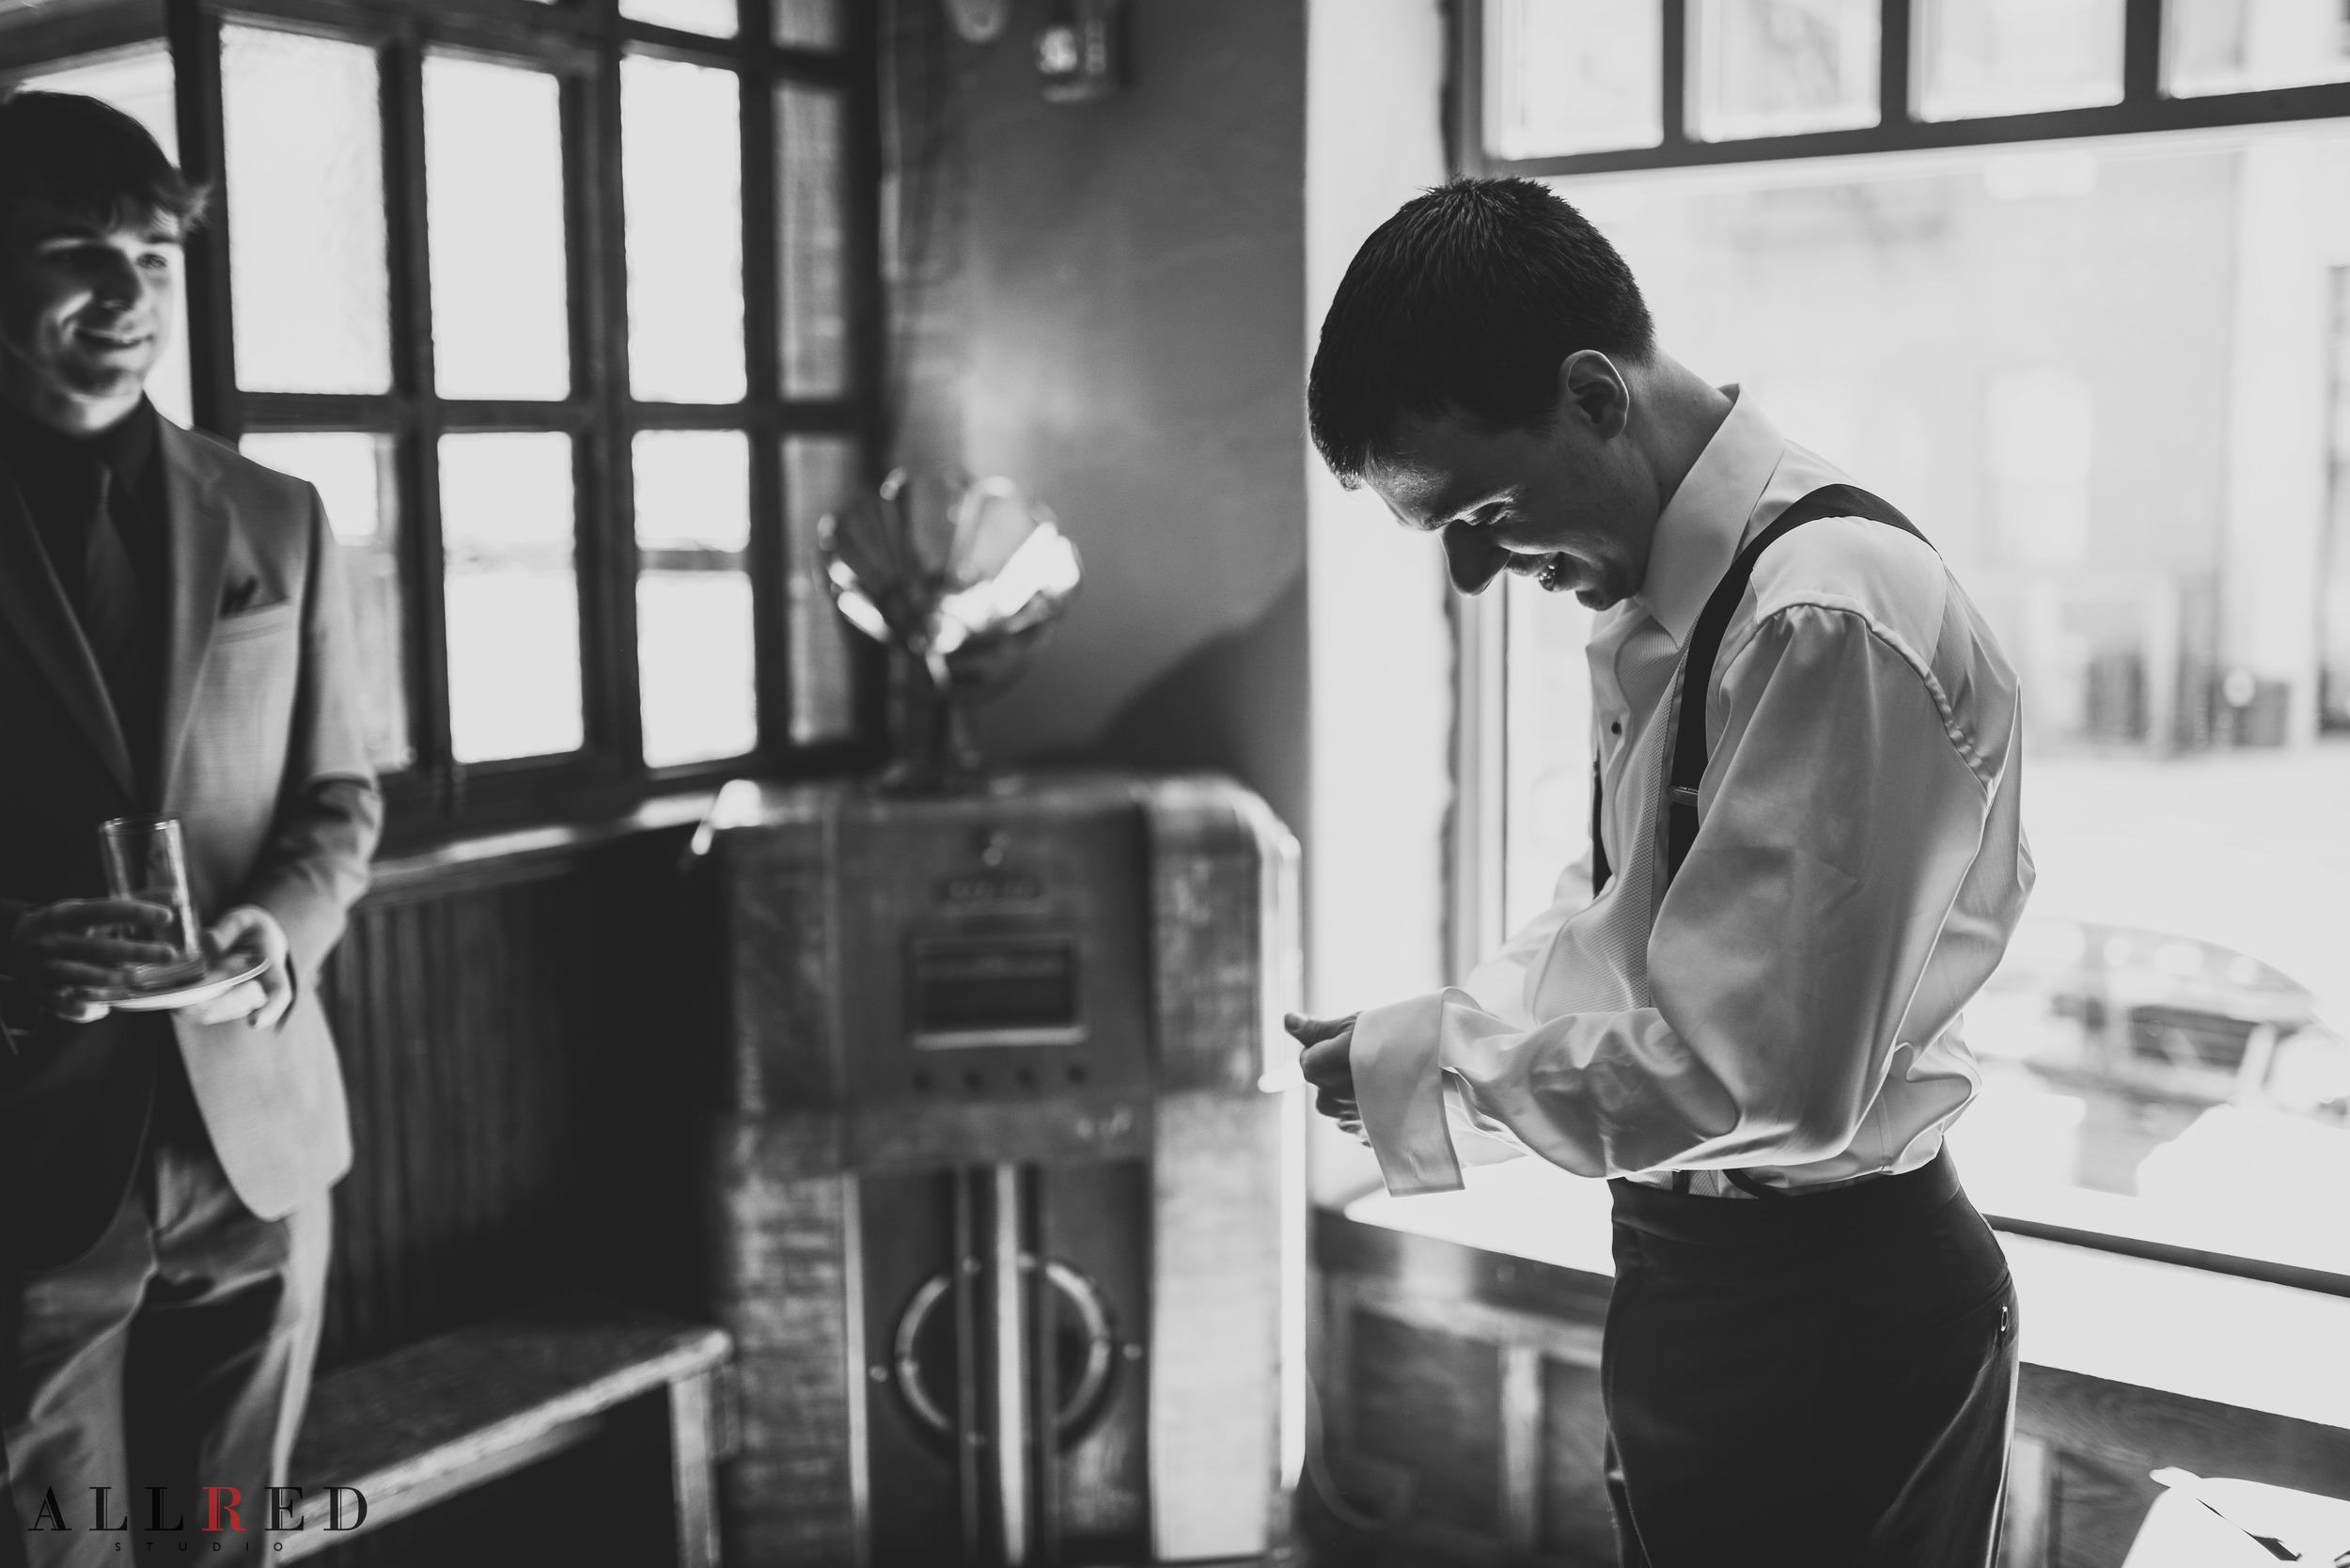 Wedding-Brooklyn-winery-allred-studio-new-york-photographer-new-jersey-hudson-valley-9536.jpg